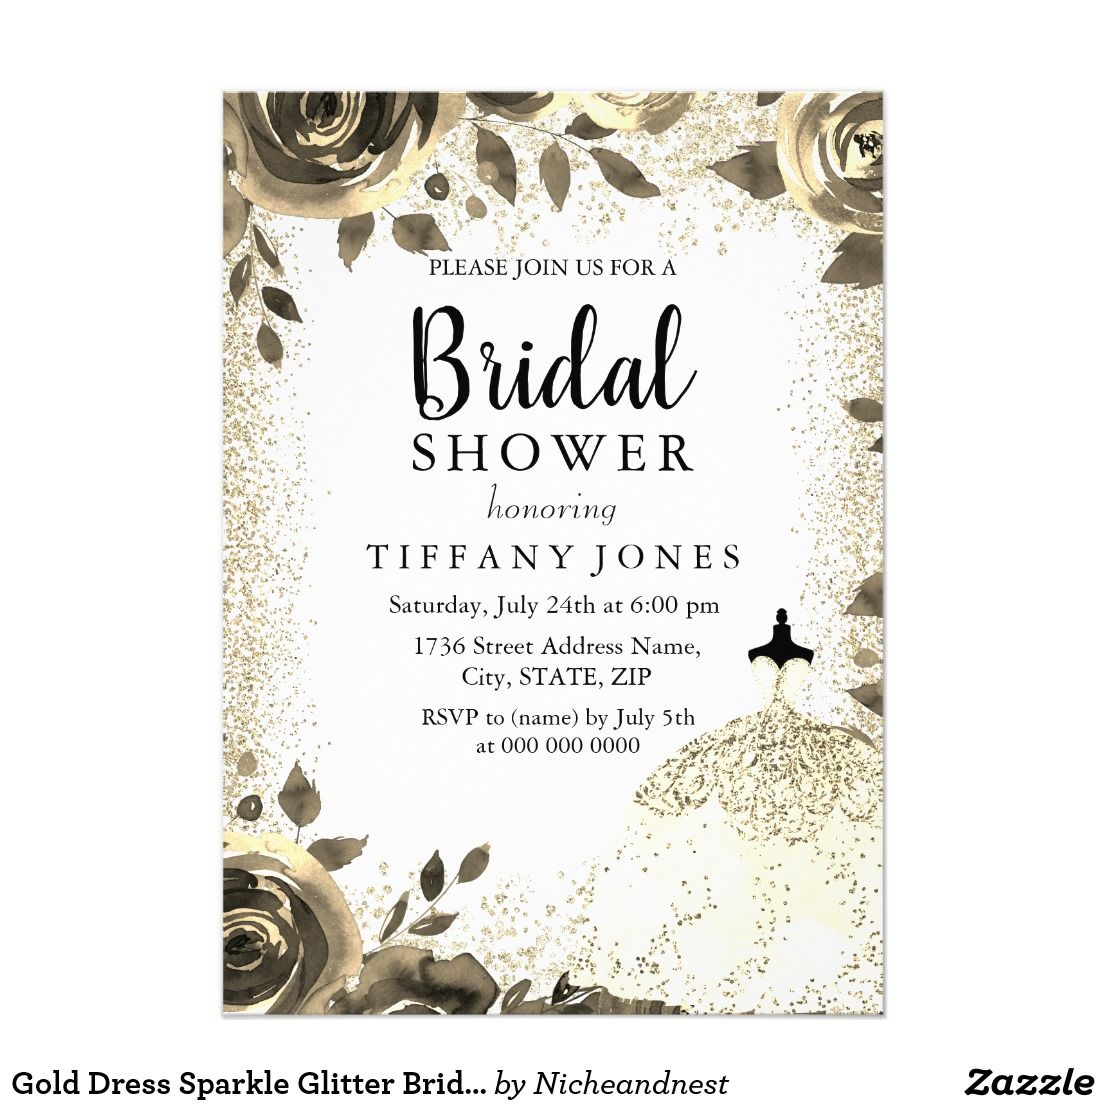 Gold Dress Sparkle Glitter Bridal Shower Invite | Bridal showers ...